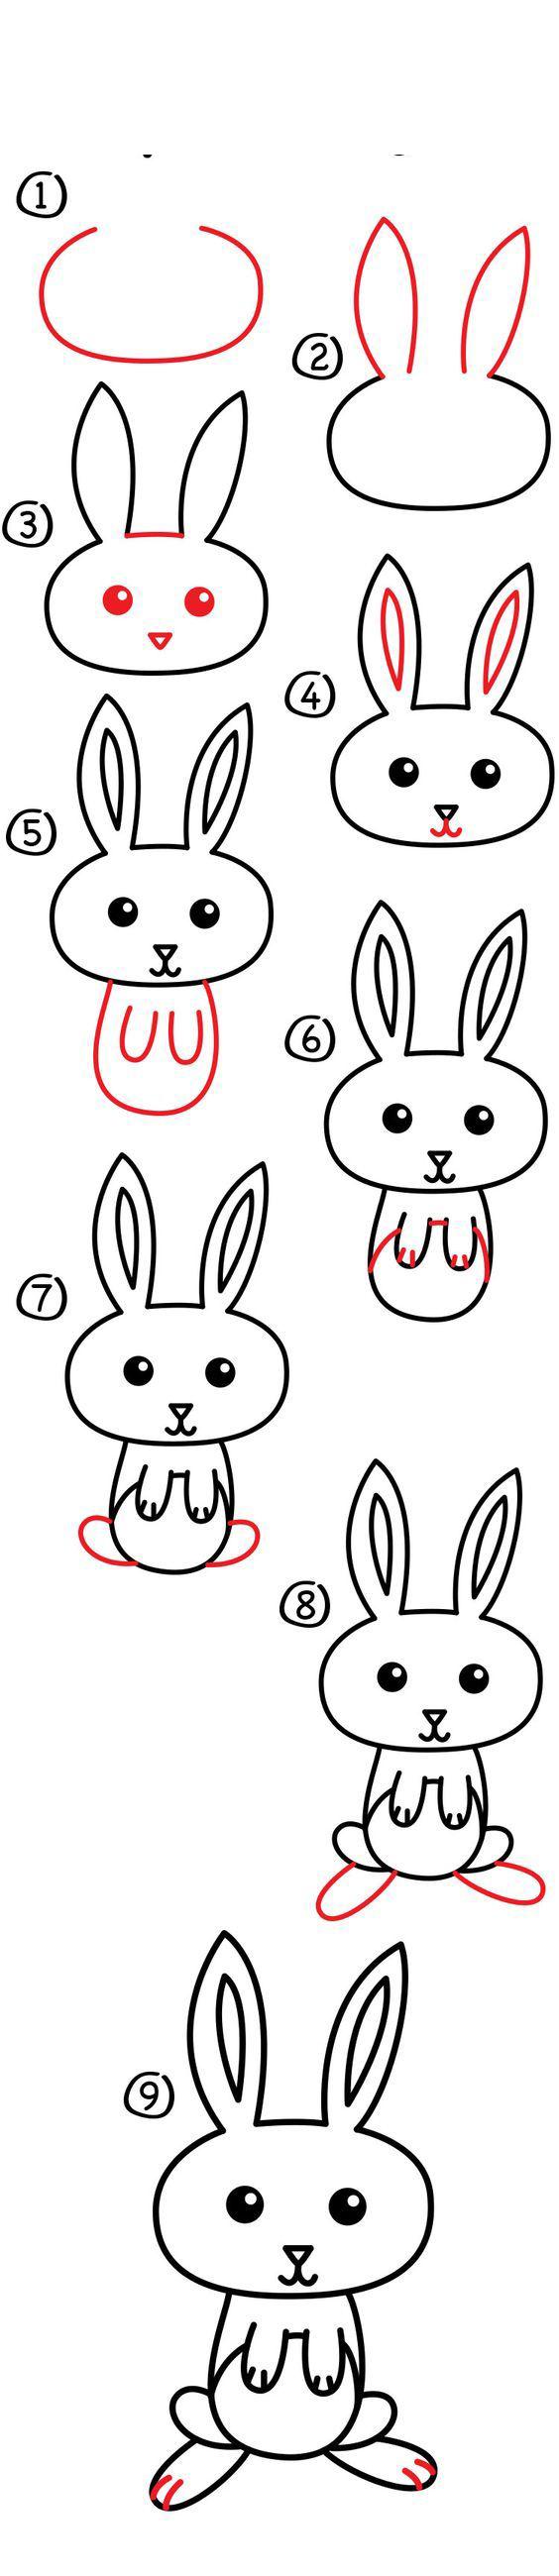 رسم أرنب